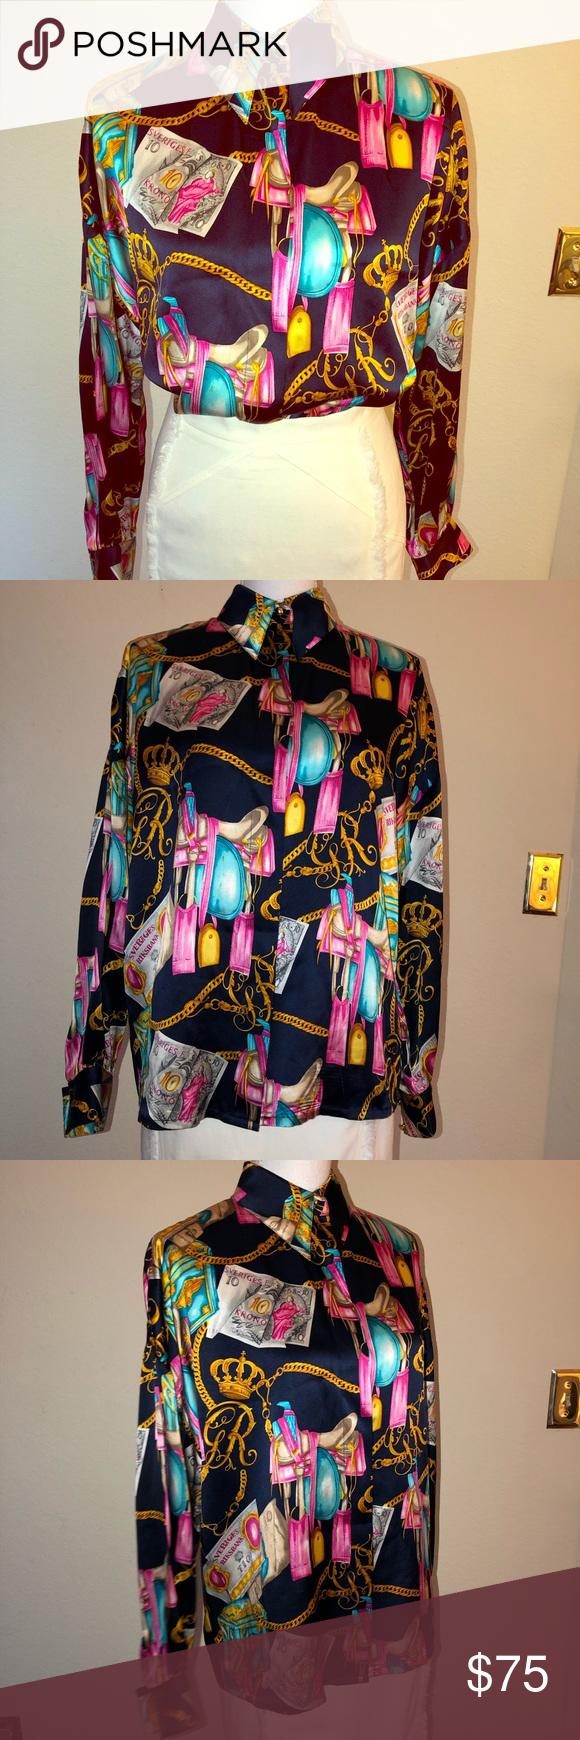 dc54733b11b9b4 Vintage Starington by Charlotte Silk Blouse Vintage 1990 s Starington  Blouses by Charlotte for Saks Fifth Avenue Silk Button-Down Blouse Size  4  (90 s ...